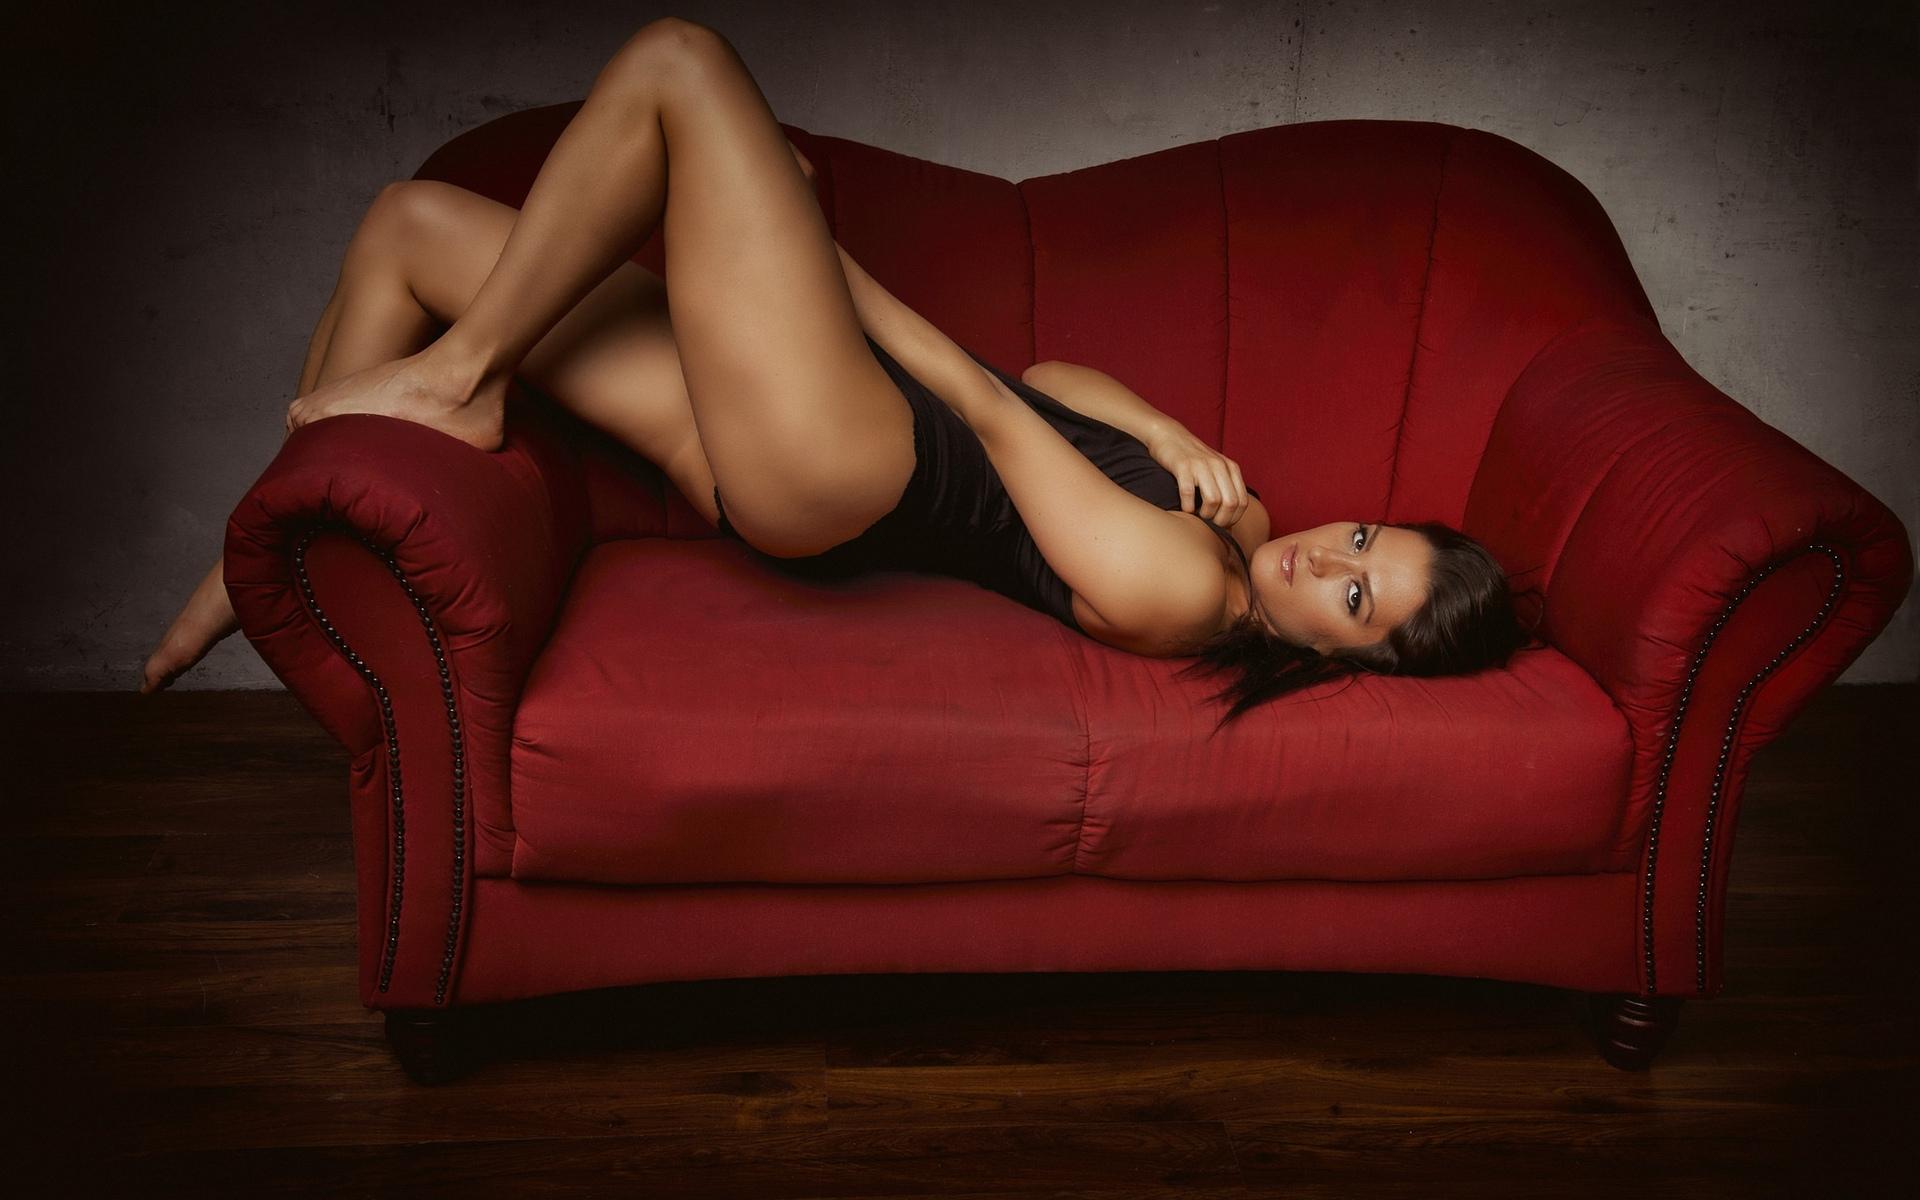 женские ножки на диване